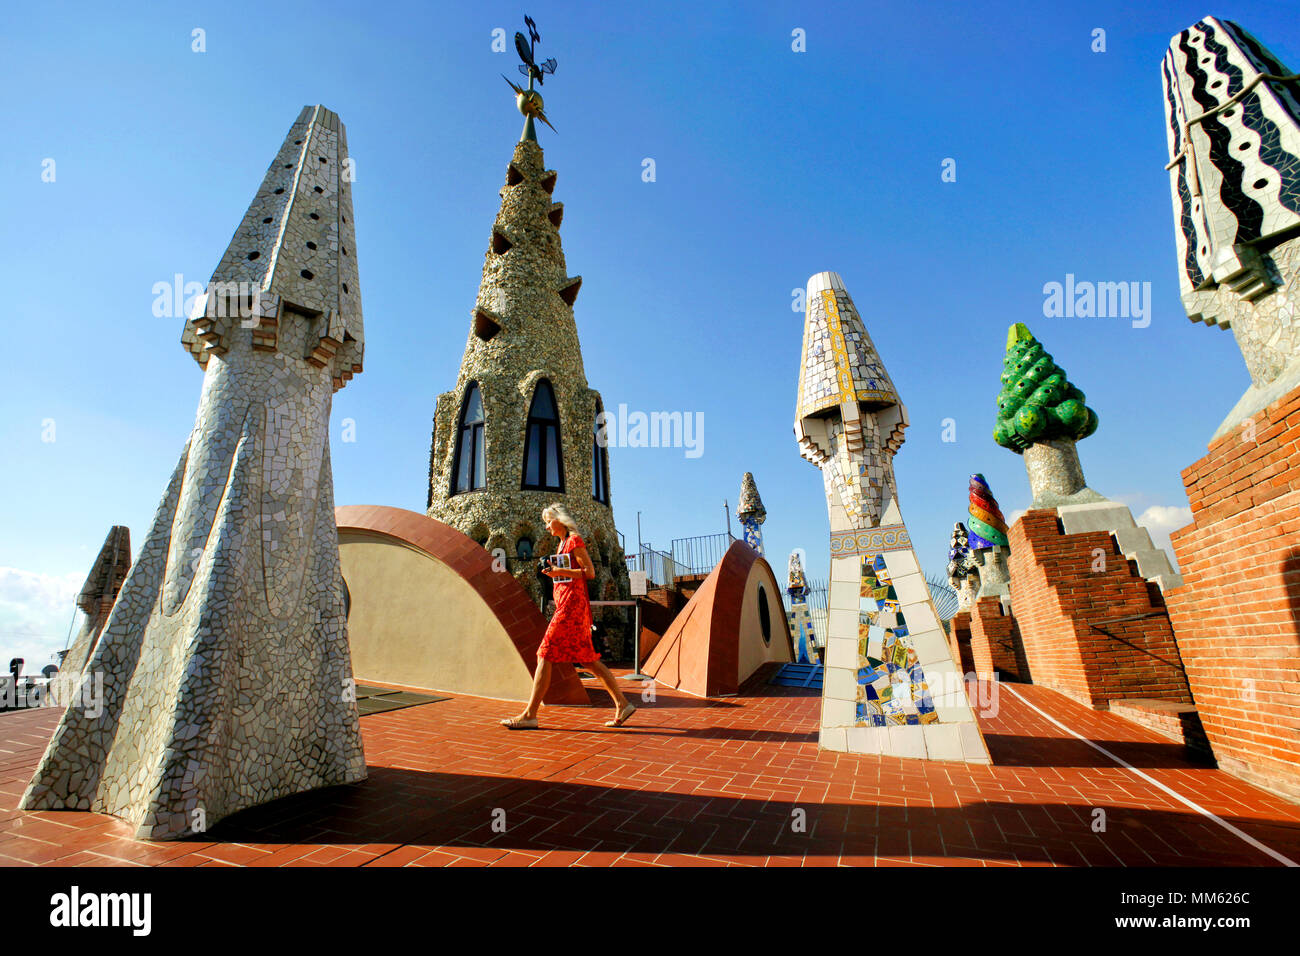 Las chimeneas por Antoni Gaudí en la cima de la Mansión Palau Güell, Barcelona, Cataluña, España Imagen De Stock